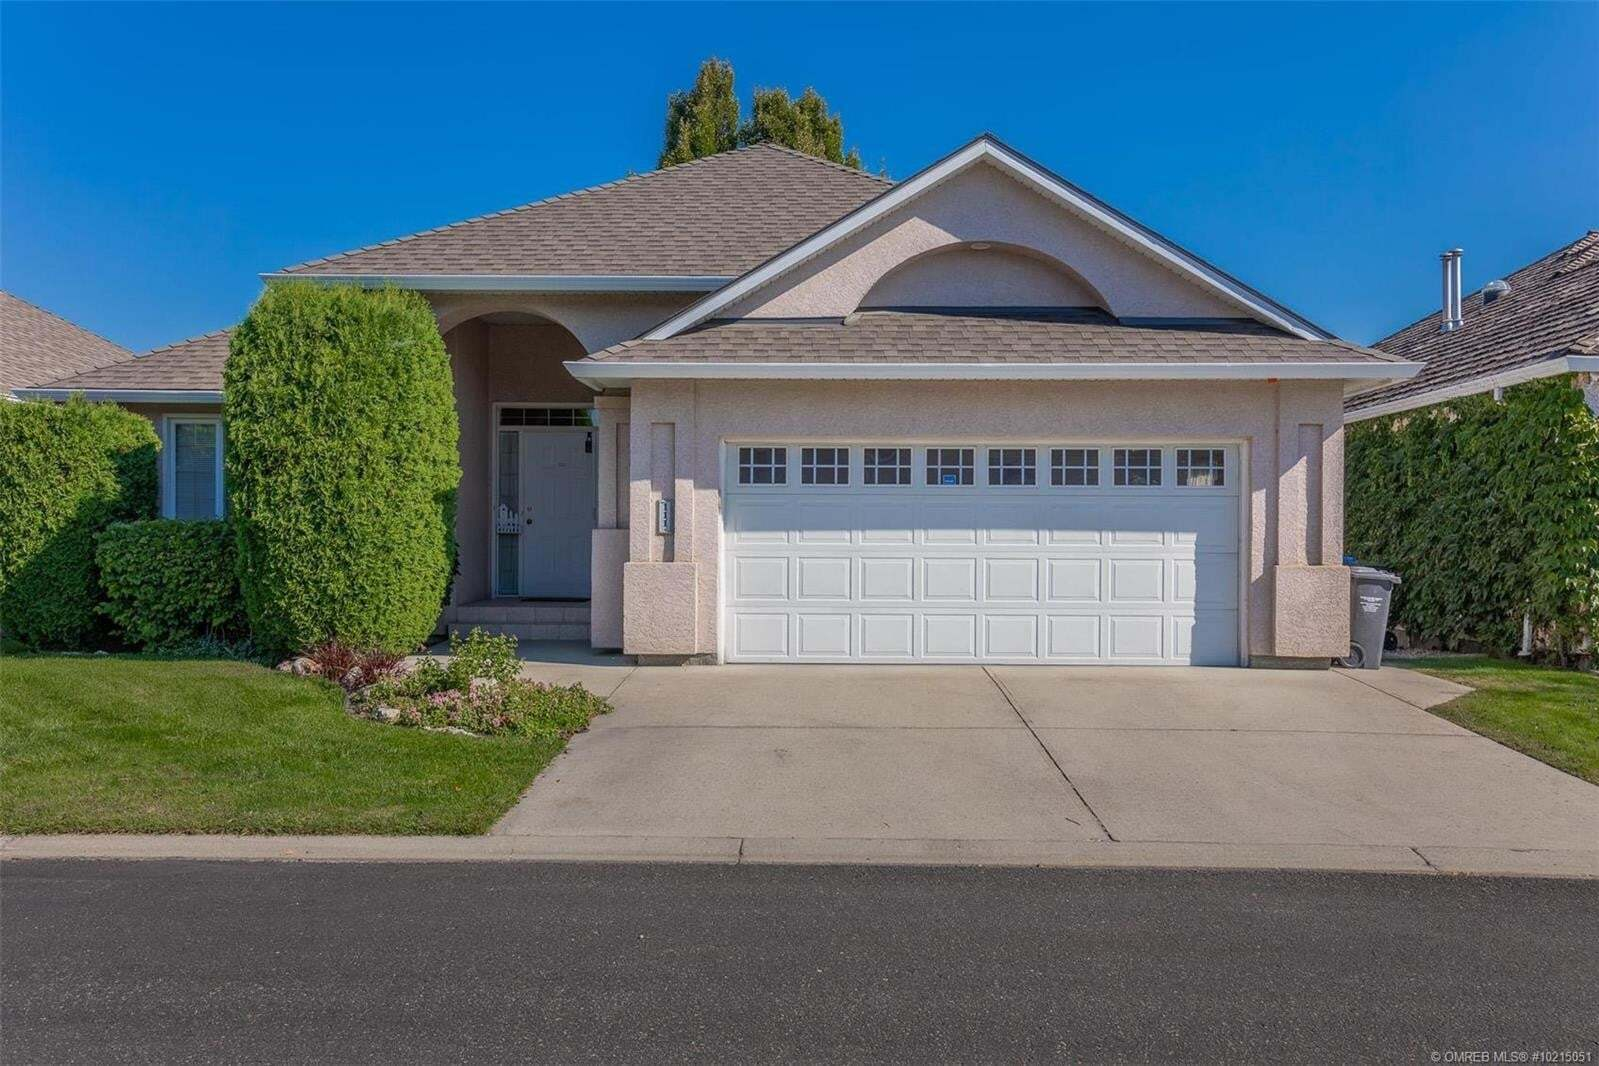 House for sale at 445 Yates Rd Kelowna British Columbia - MLS: 10215051